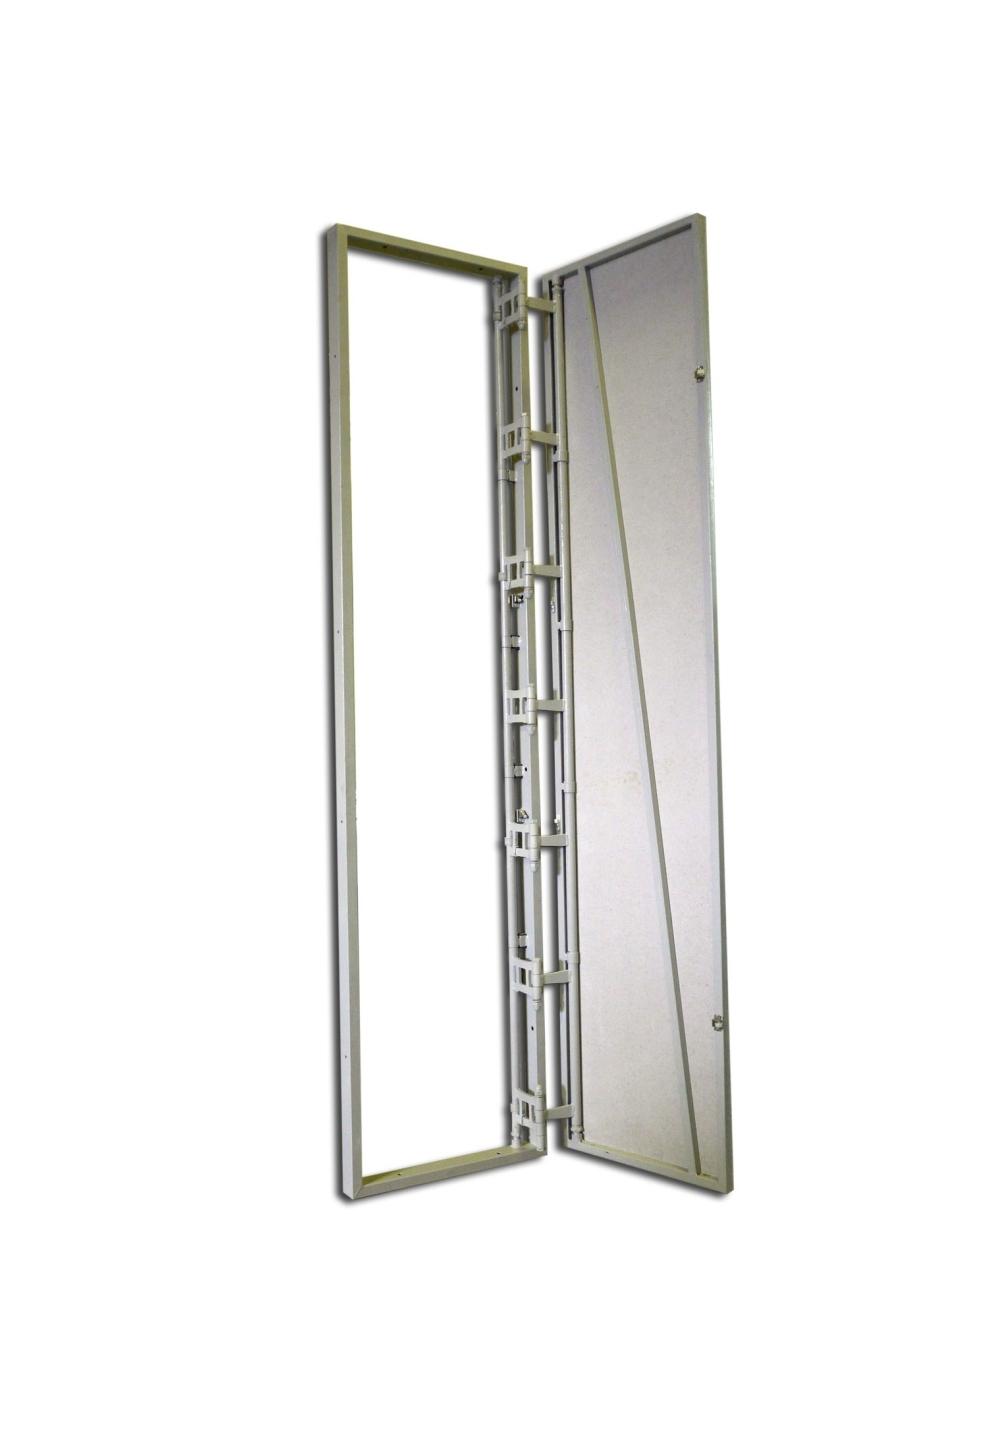 металлические двери 1800 800